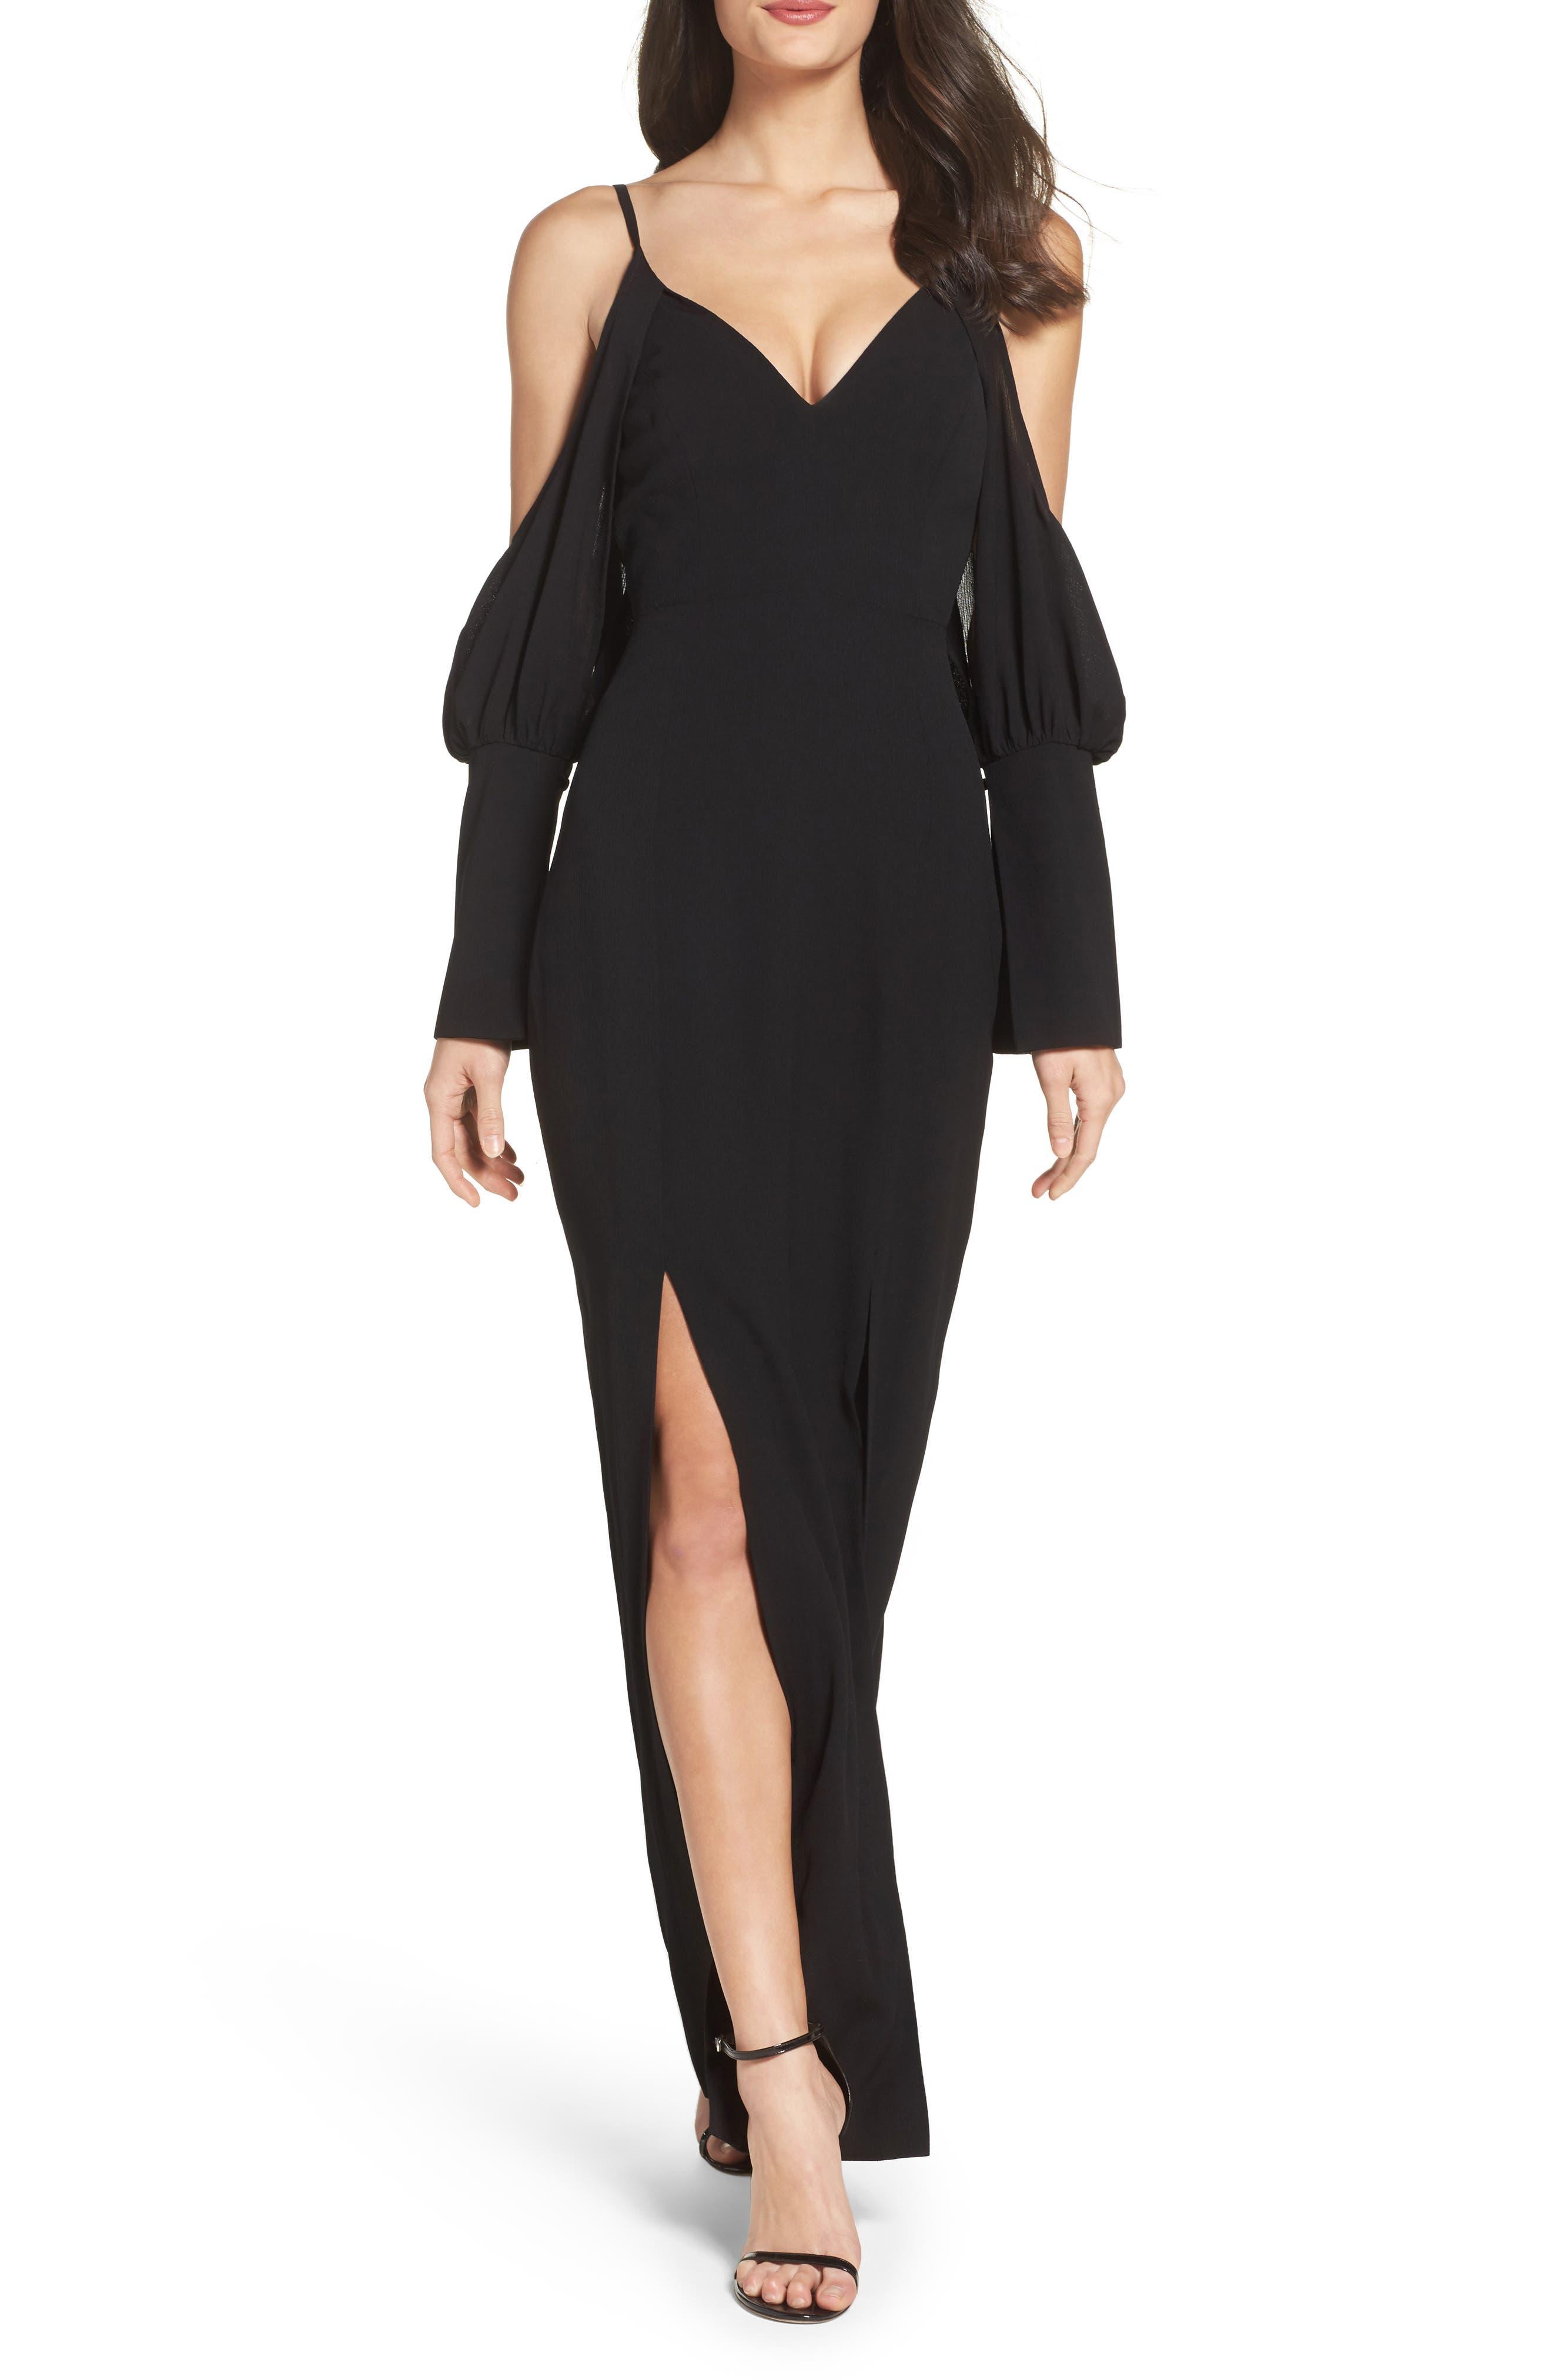 C/MEO Collective No Reason Cold Shoulder Maxi Dress